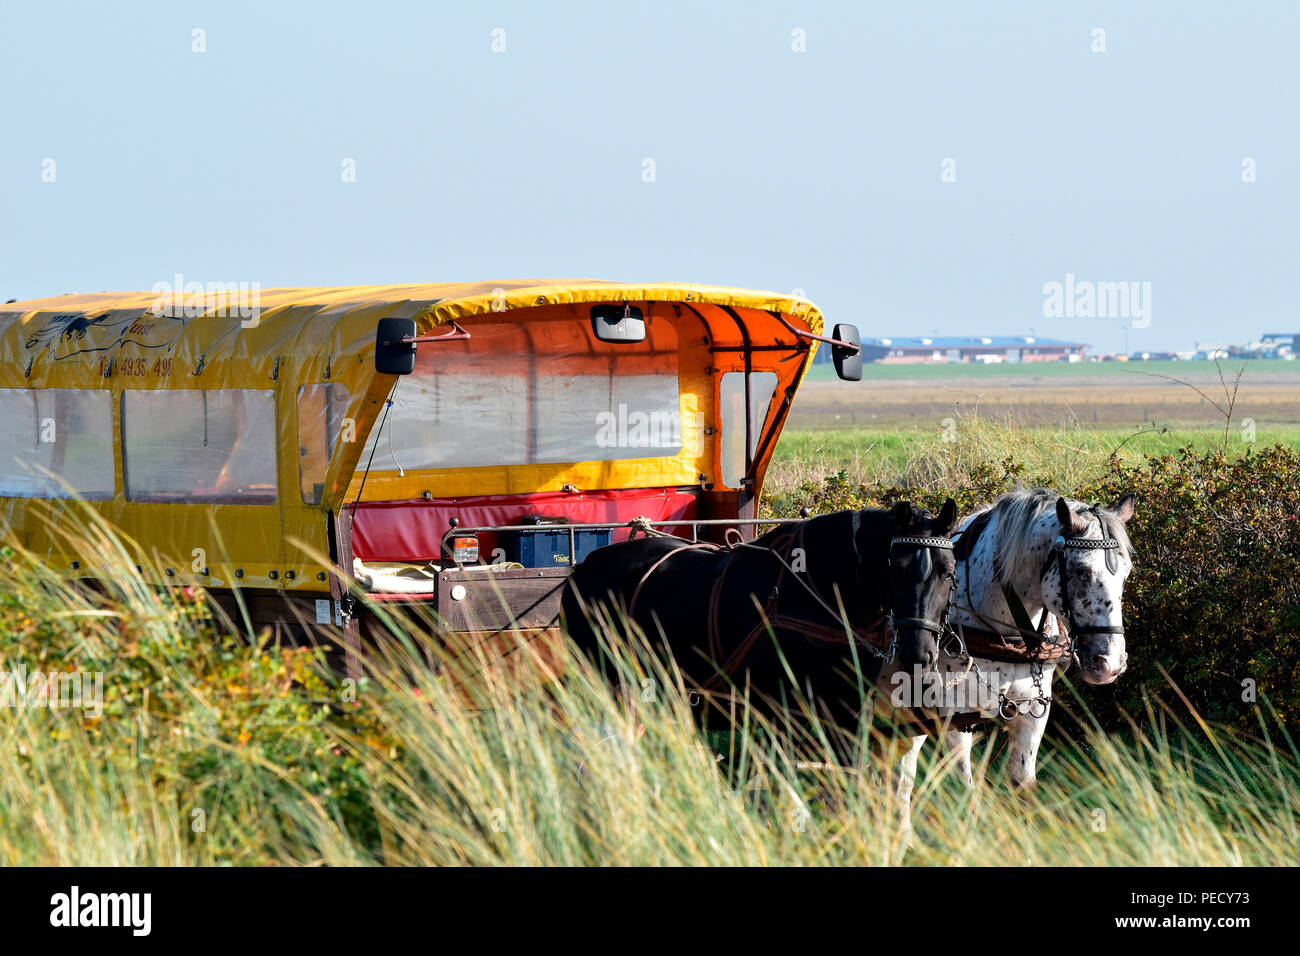 Team of Horses, Juist, National Park Wadden Sea, Lower Saxony, East Frisian Island, Germany Stock Photo